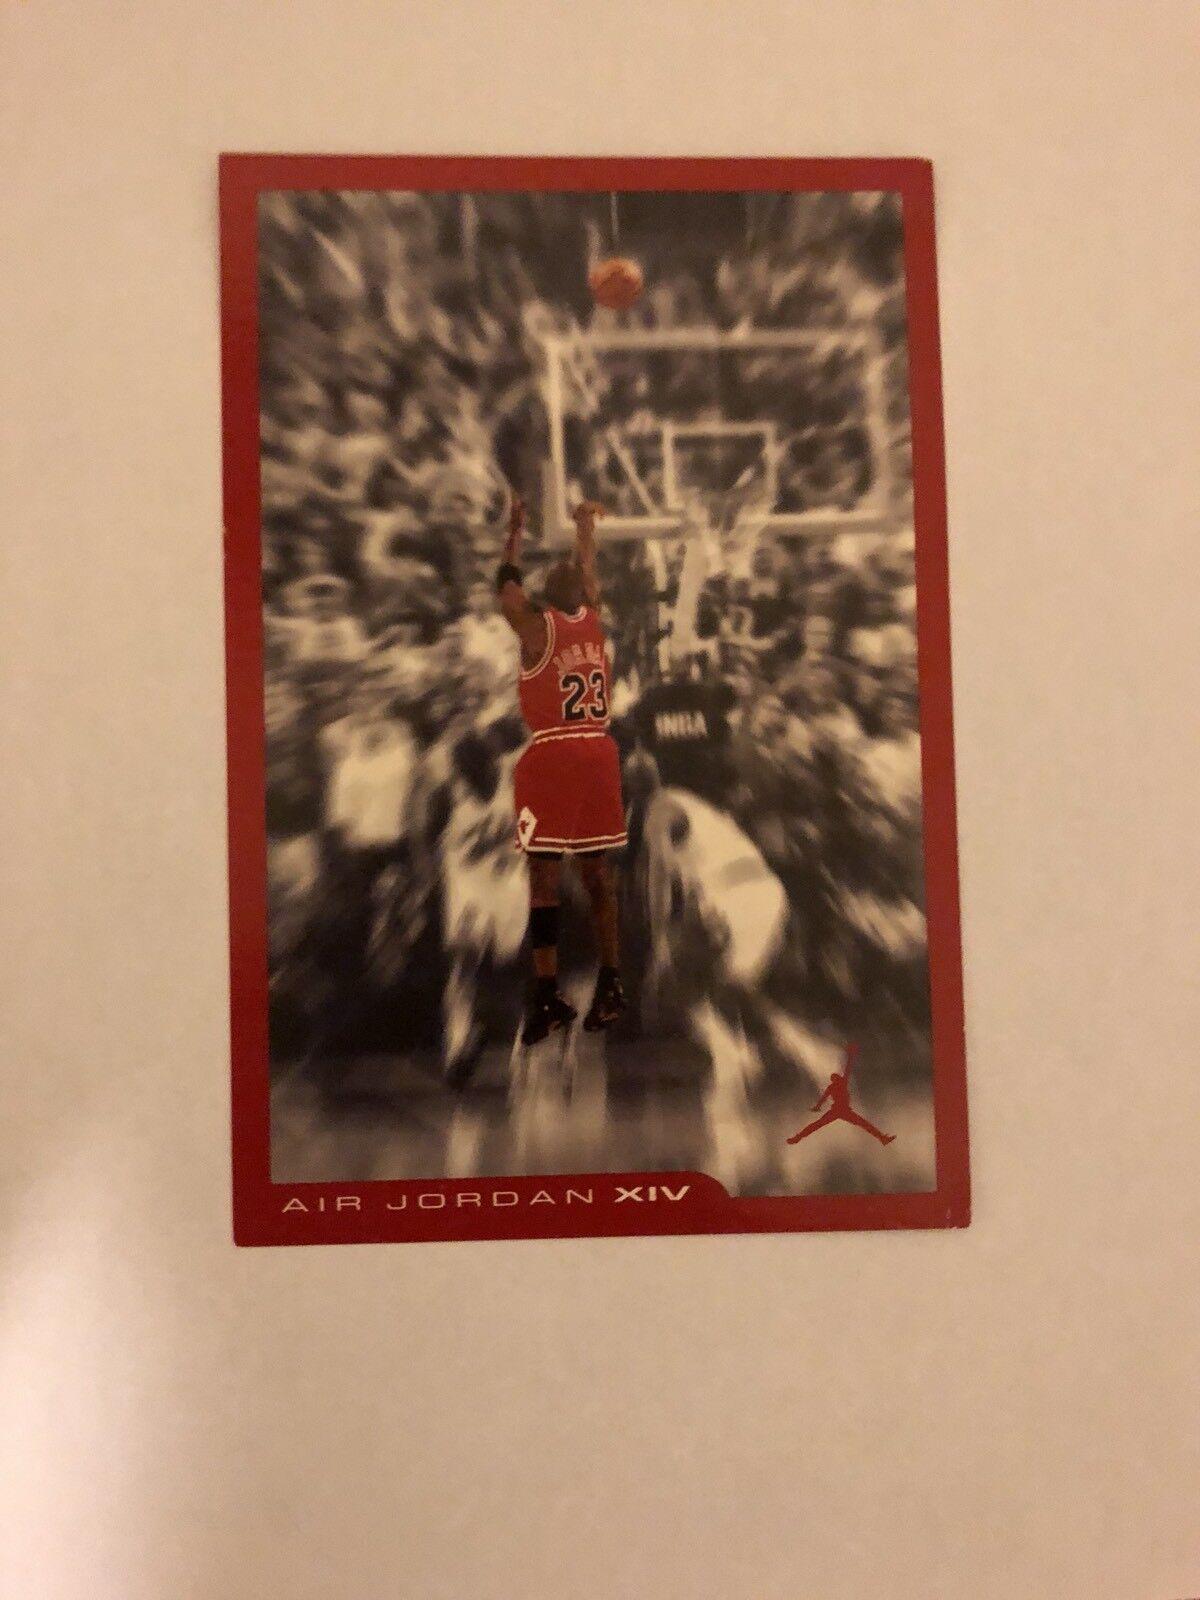 Man/Woman Nike Air Jordan XIV 14 RETRO CARD LAST SHOT RED PLAYOFF BLACK TOE RED SHOT BRED FERRARI selling price Impeccable Different styles RB23 b2baef